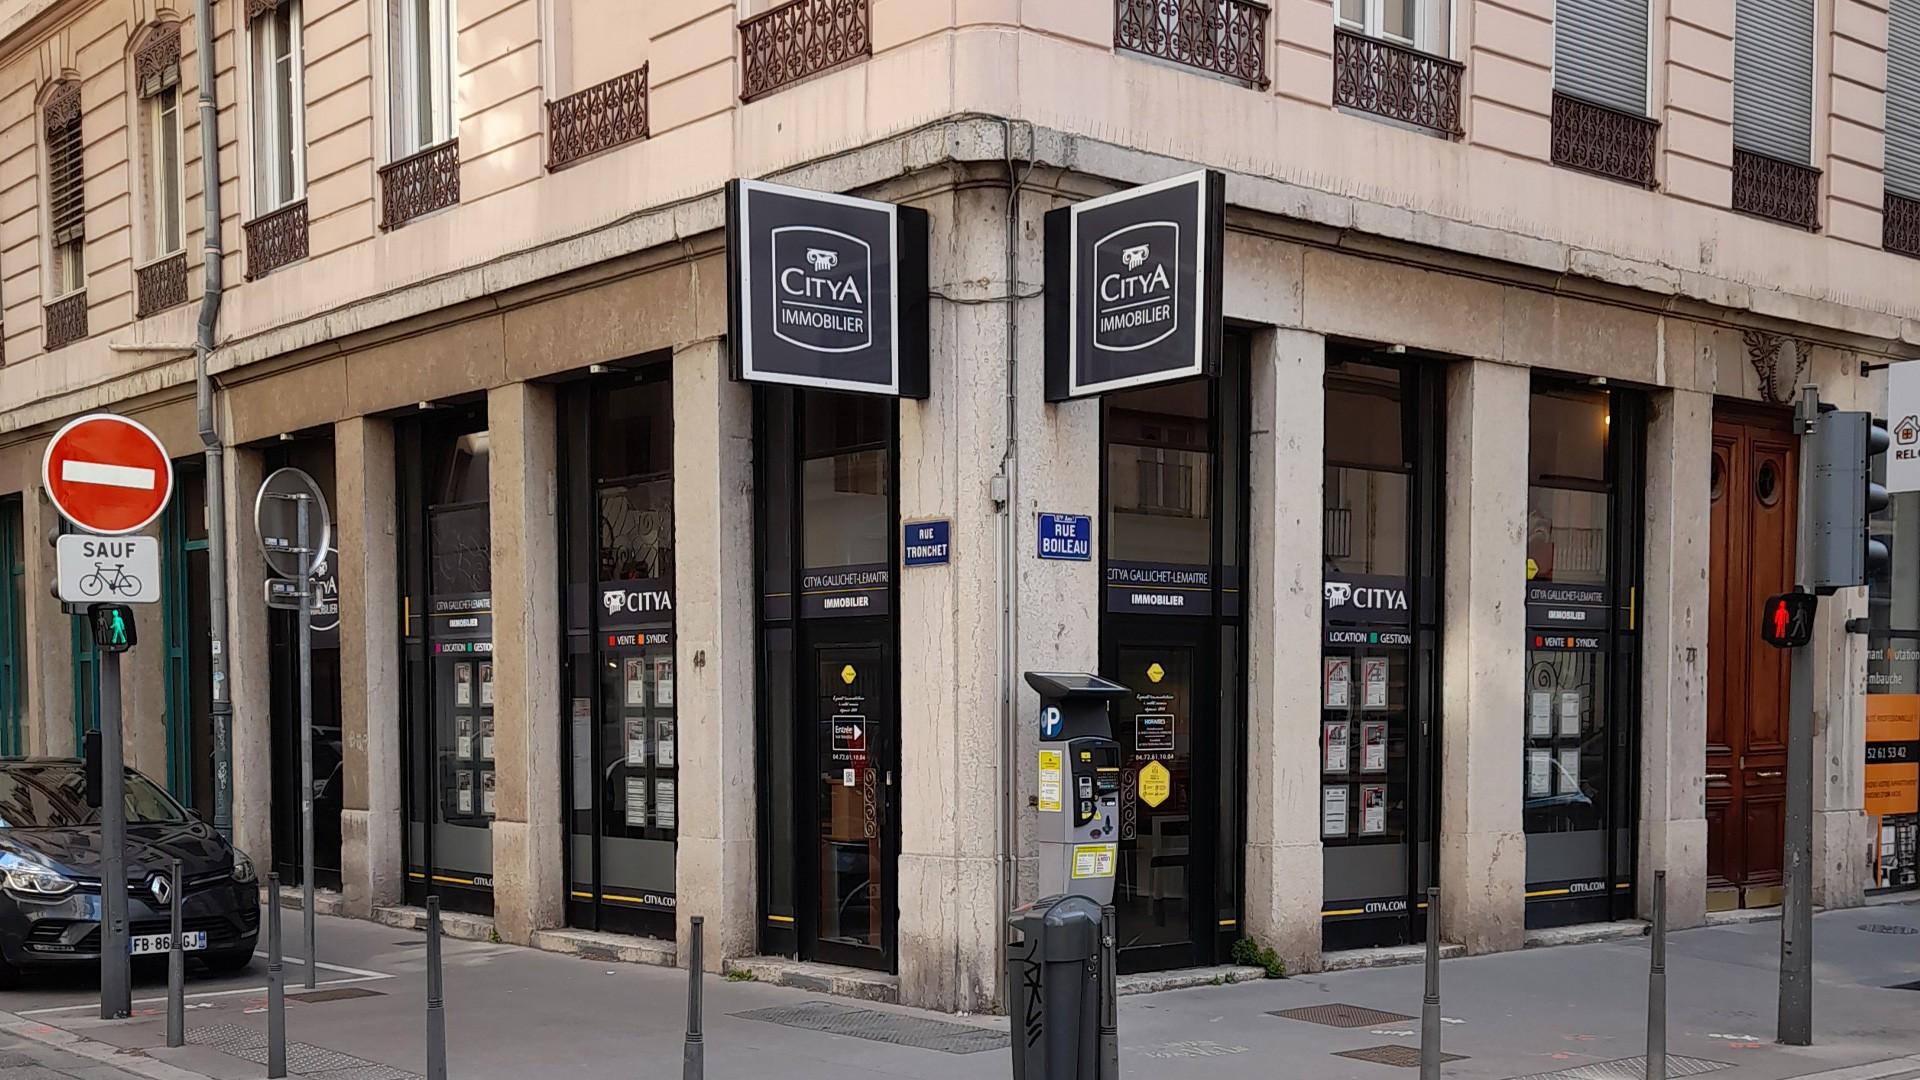 Agence immo Citya Gallichet-Lemaitre